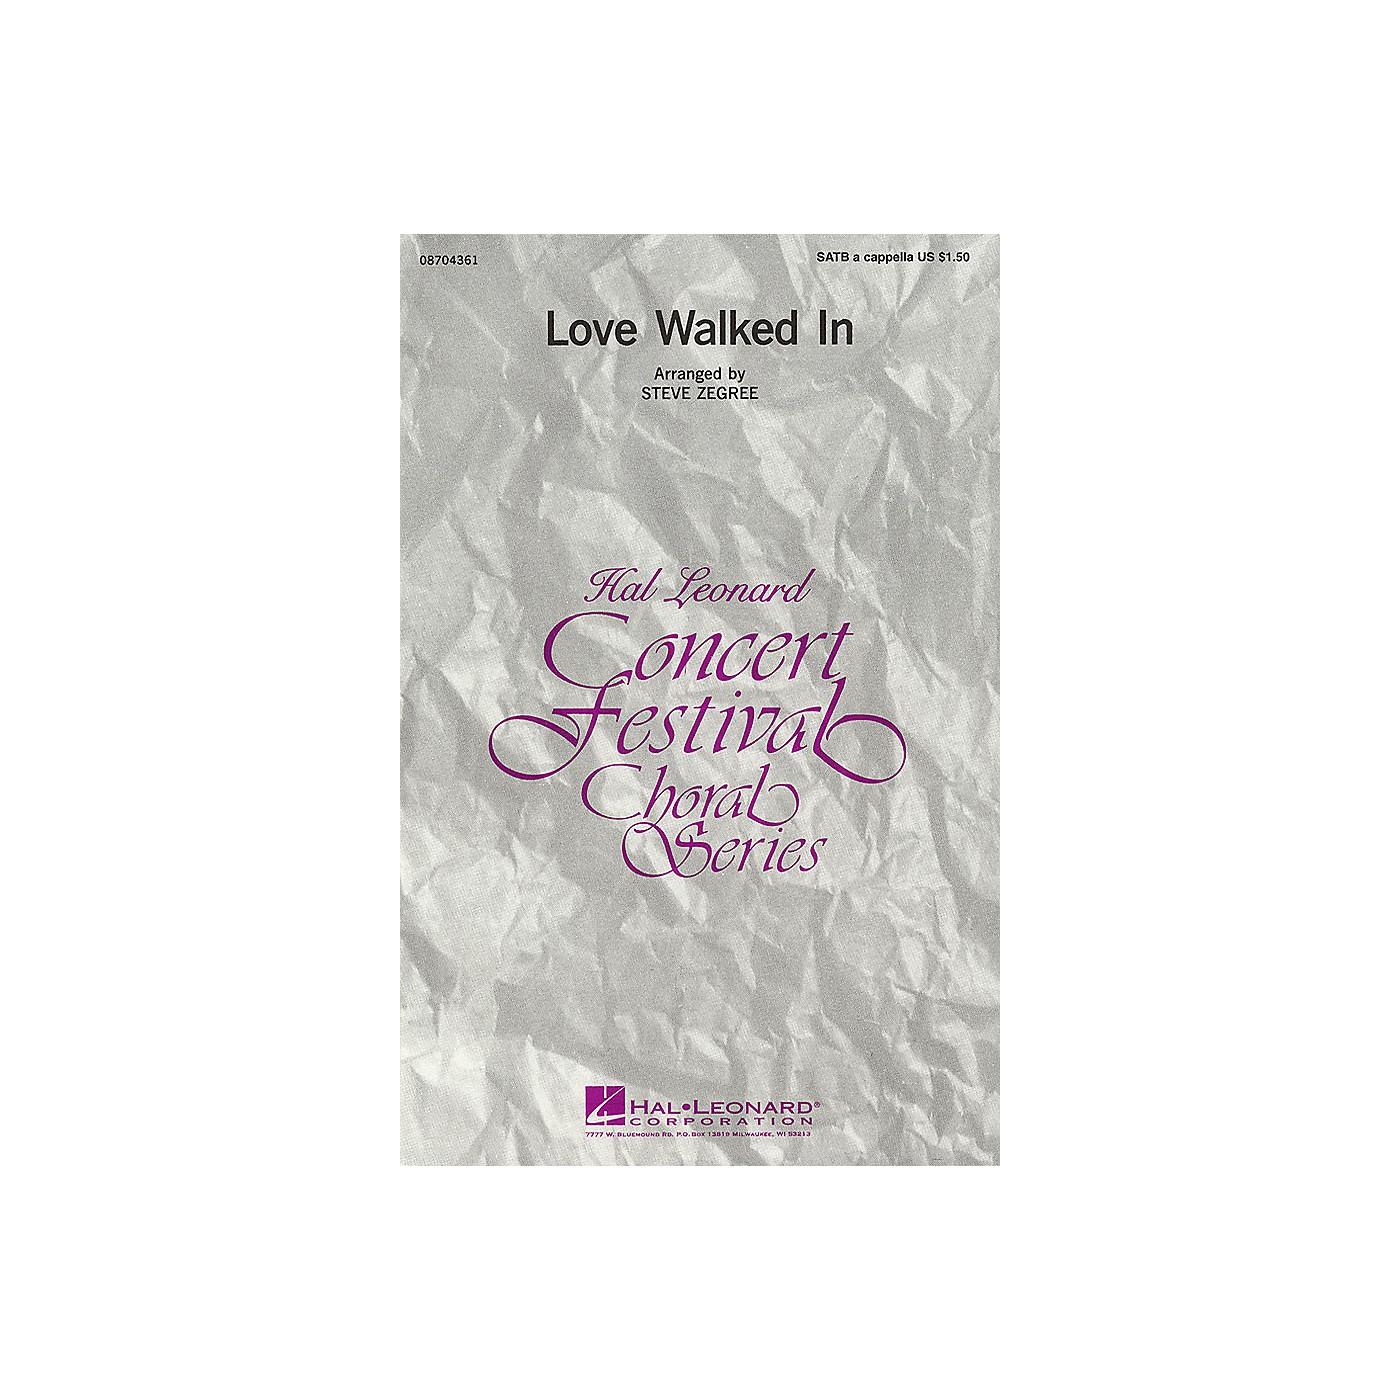 Hal Leonard Love Walked In SATB arranged by Steve Zegree thumbnail